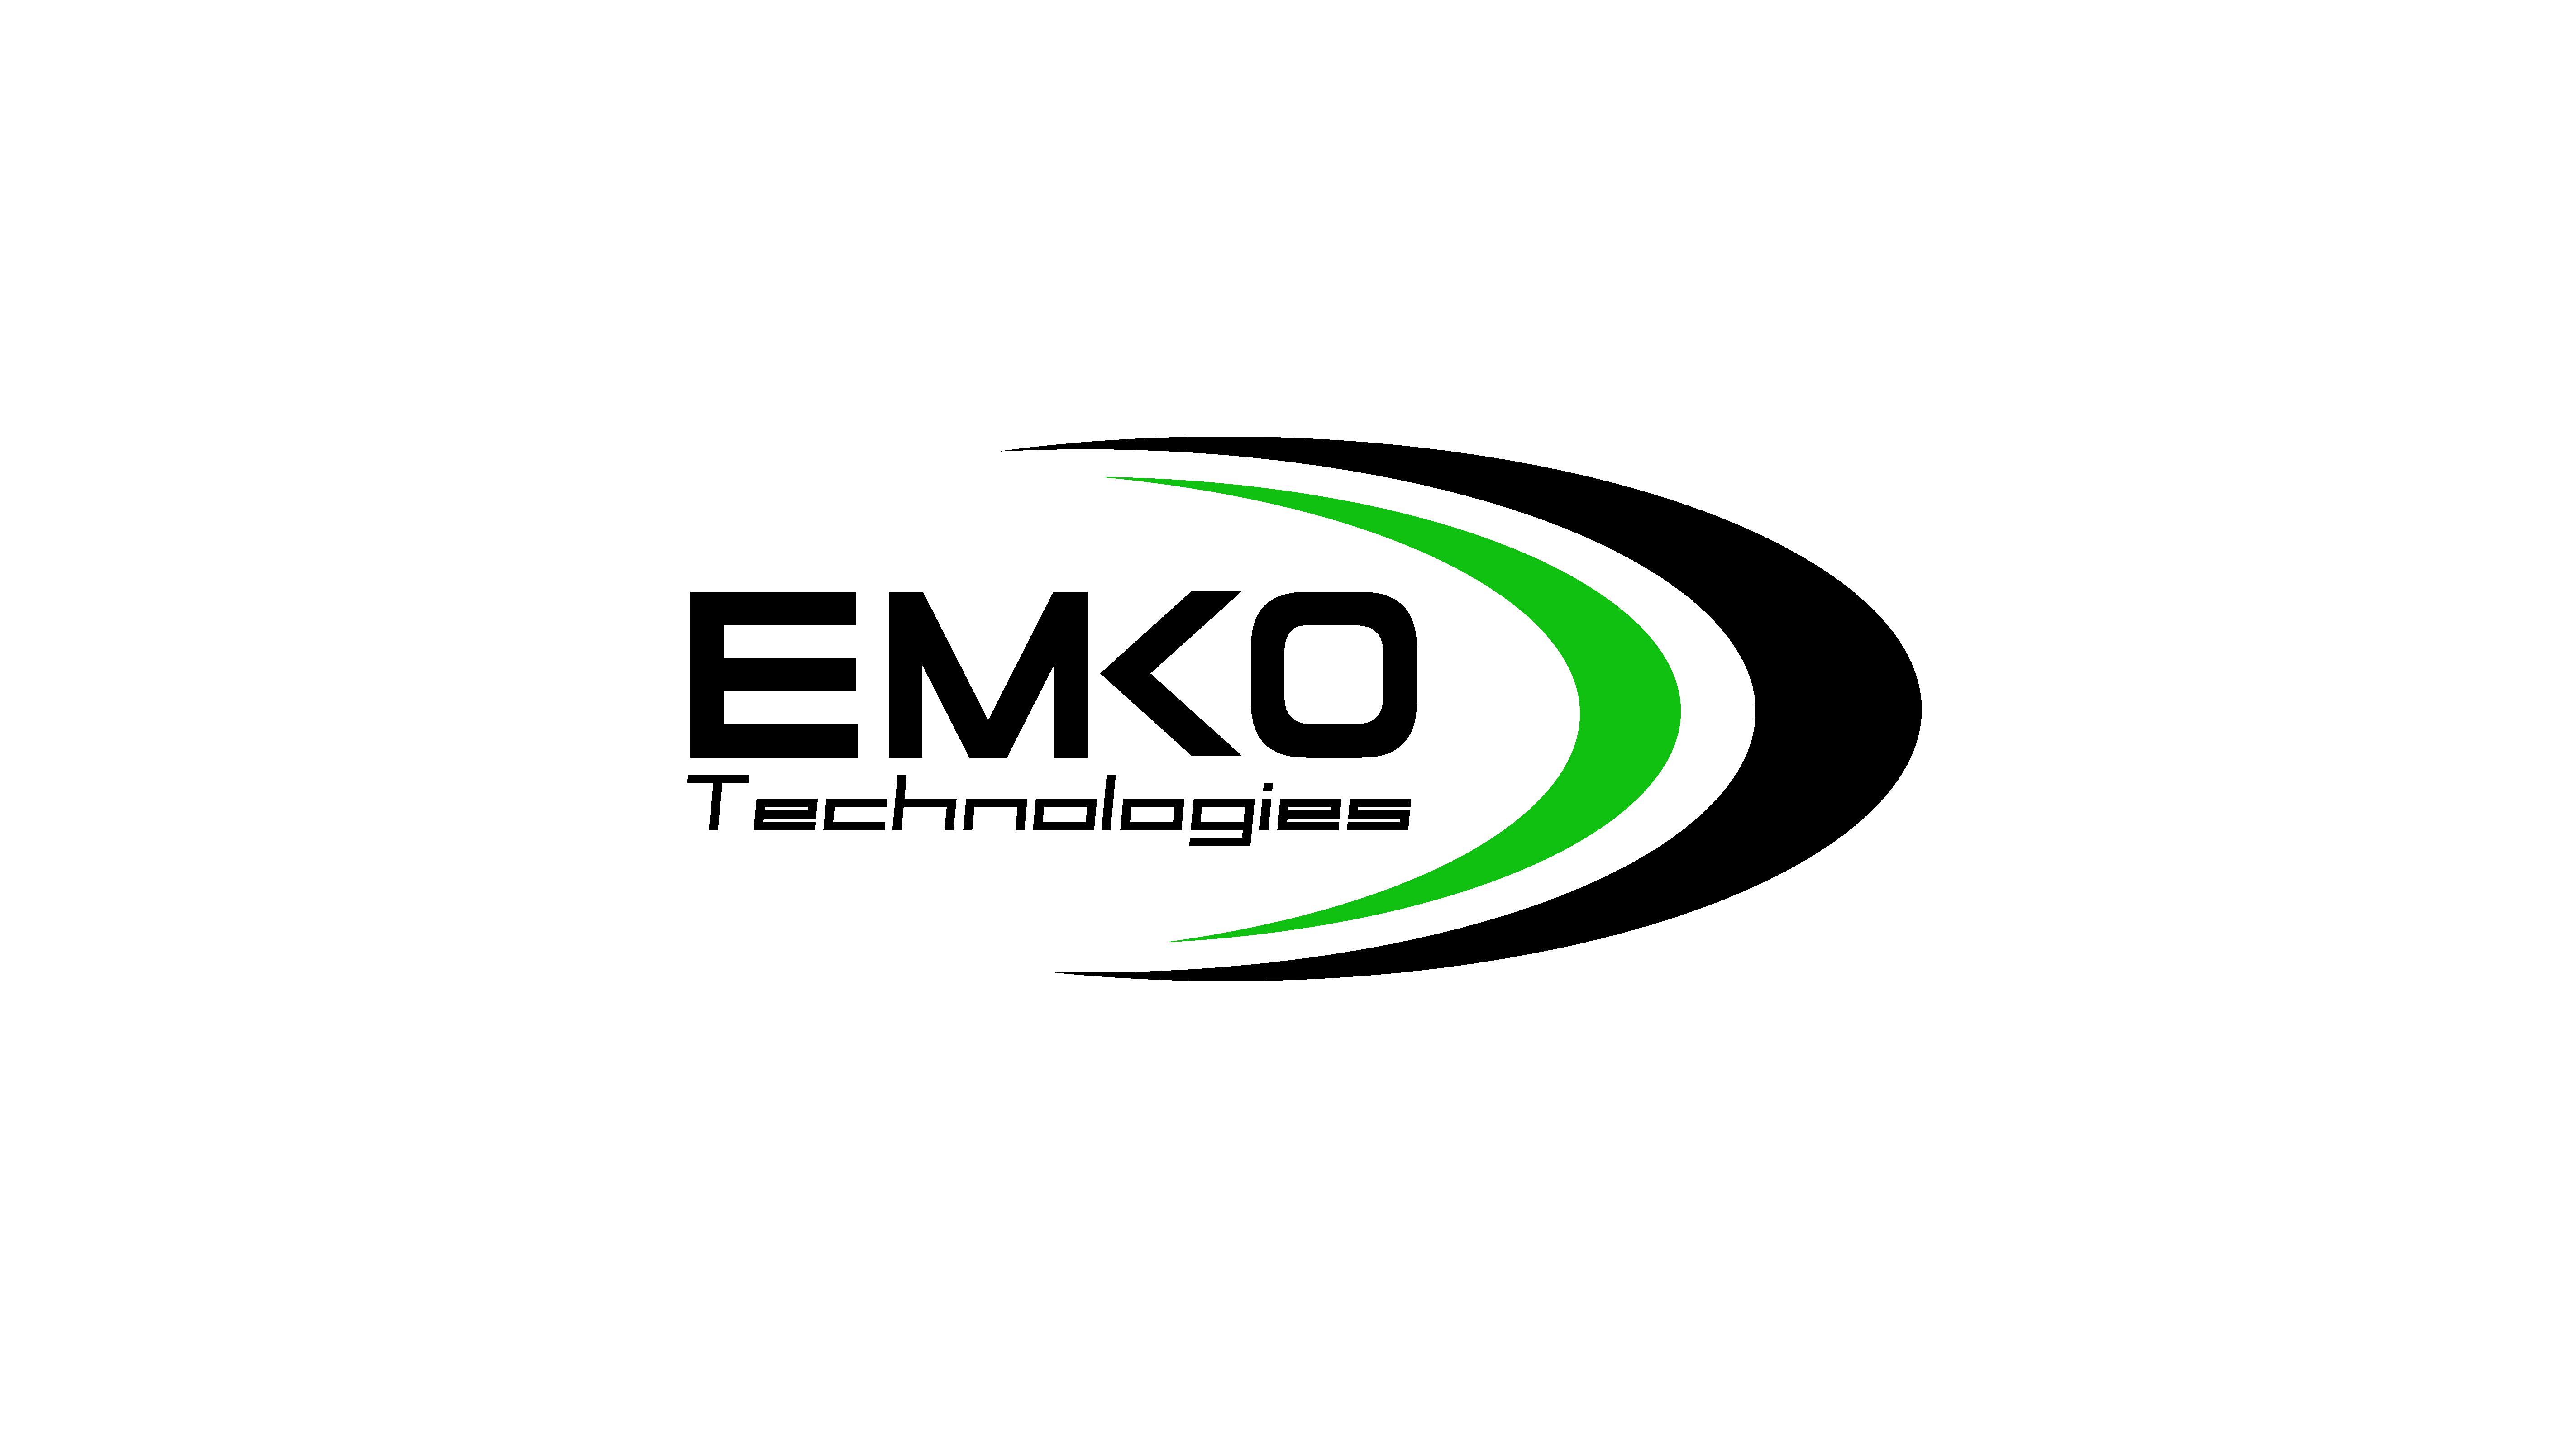 Emko Technologies LLC